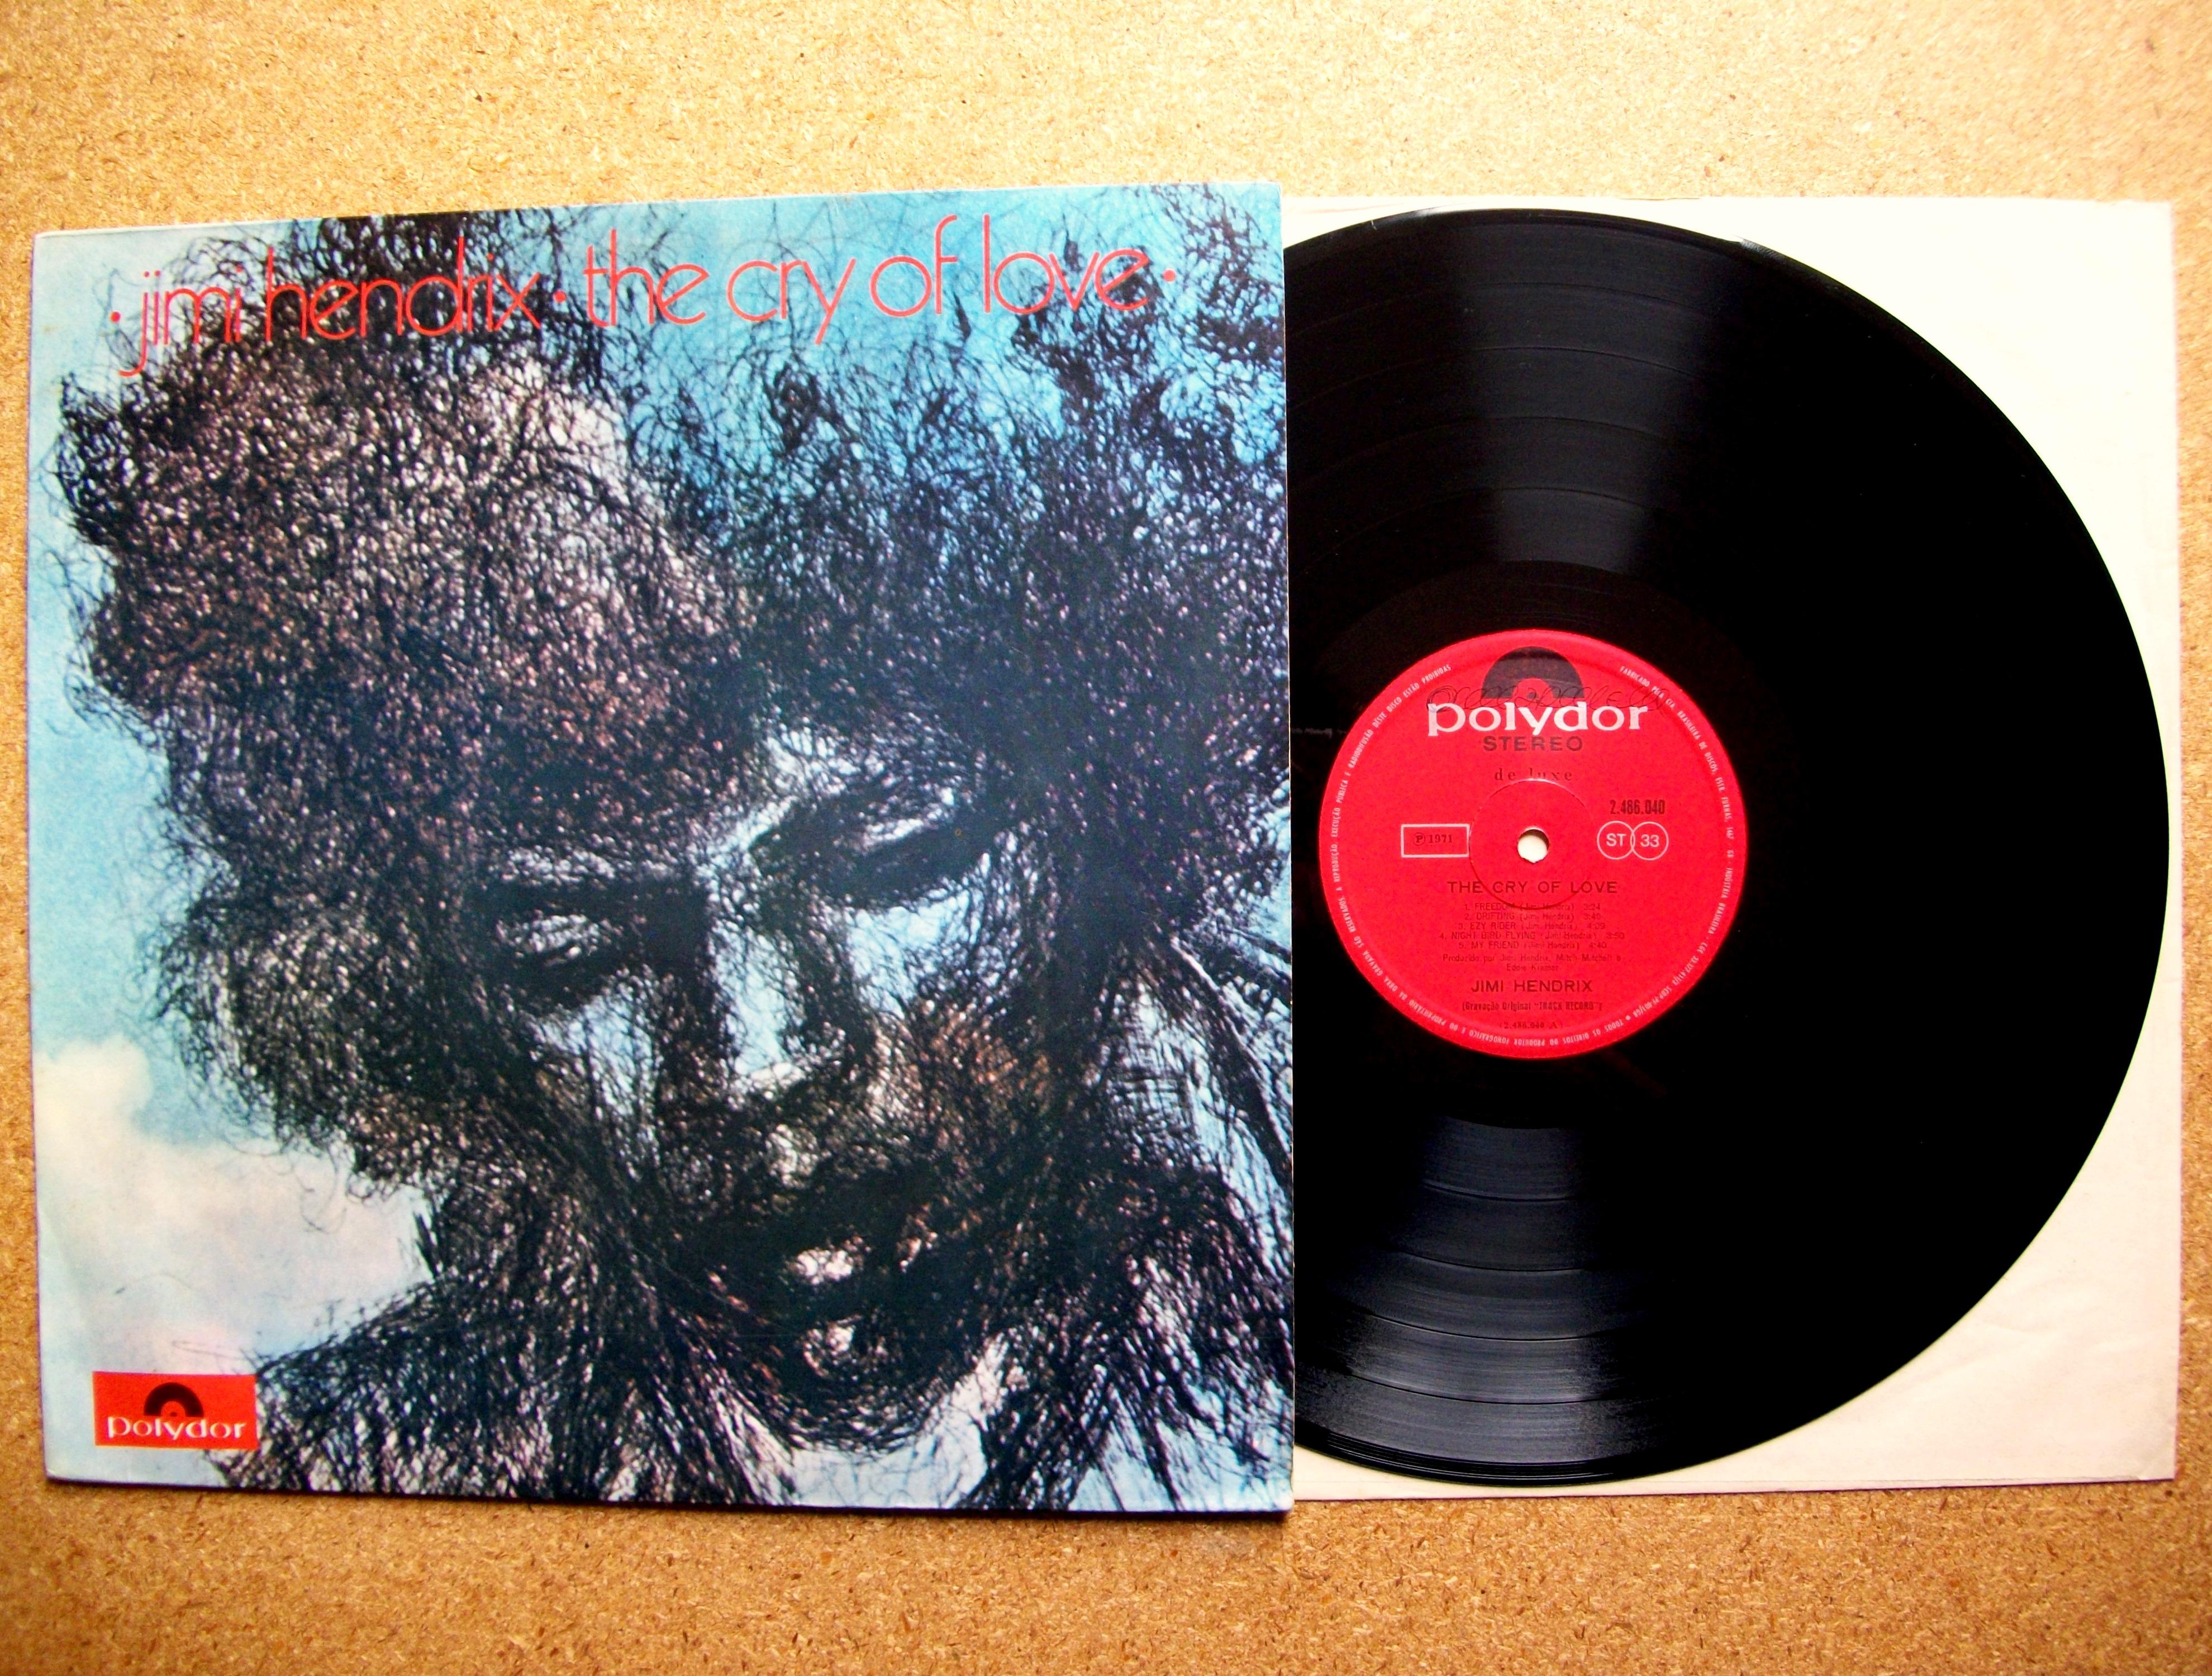 sinister vinyl collection jimi hendrix the cry of love 1971 sinister salad musikal 39 s weblog. Black Bedroom Furniture Sets. Home Design Ideas